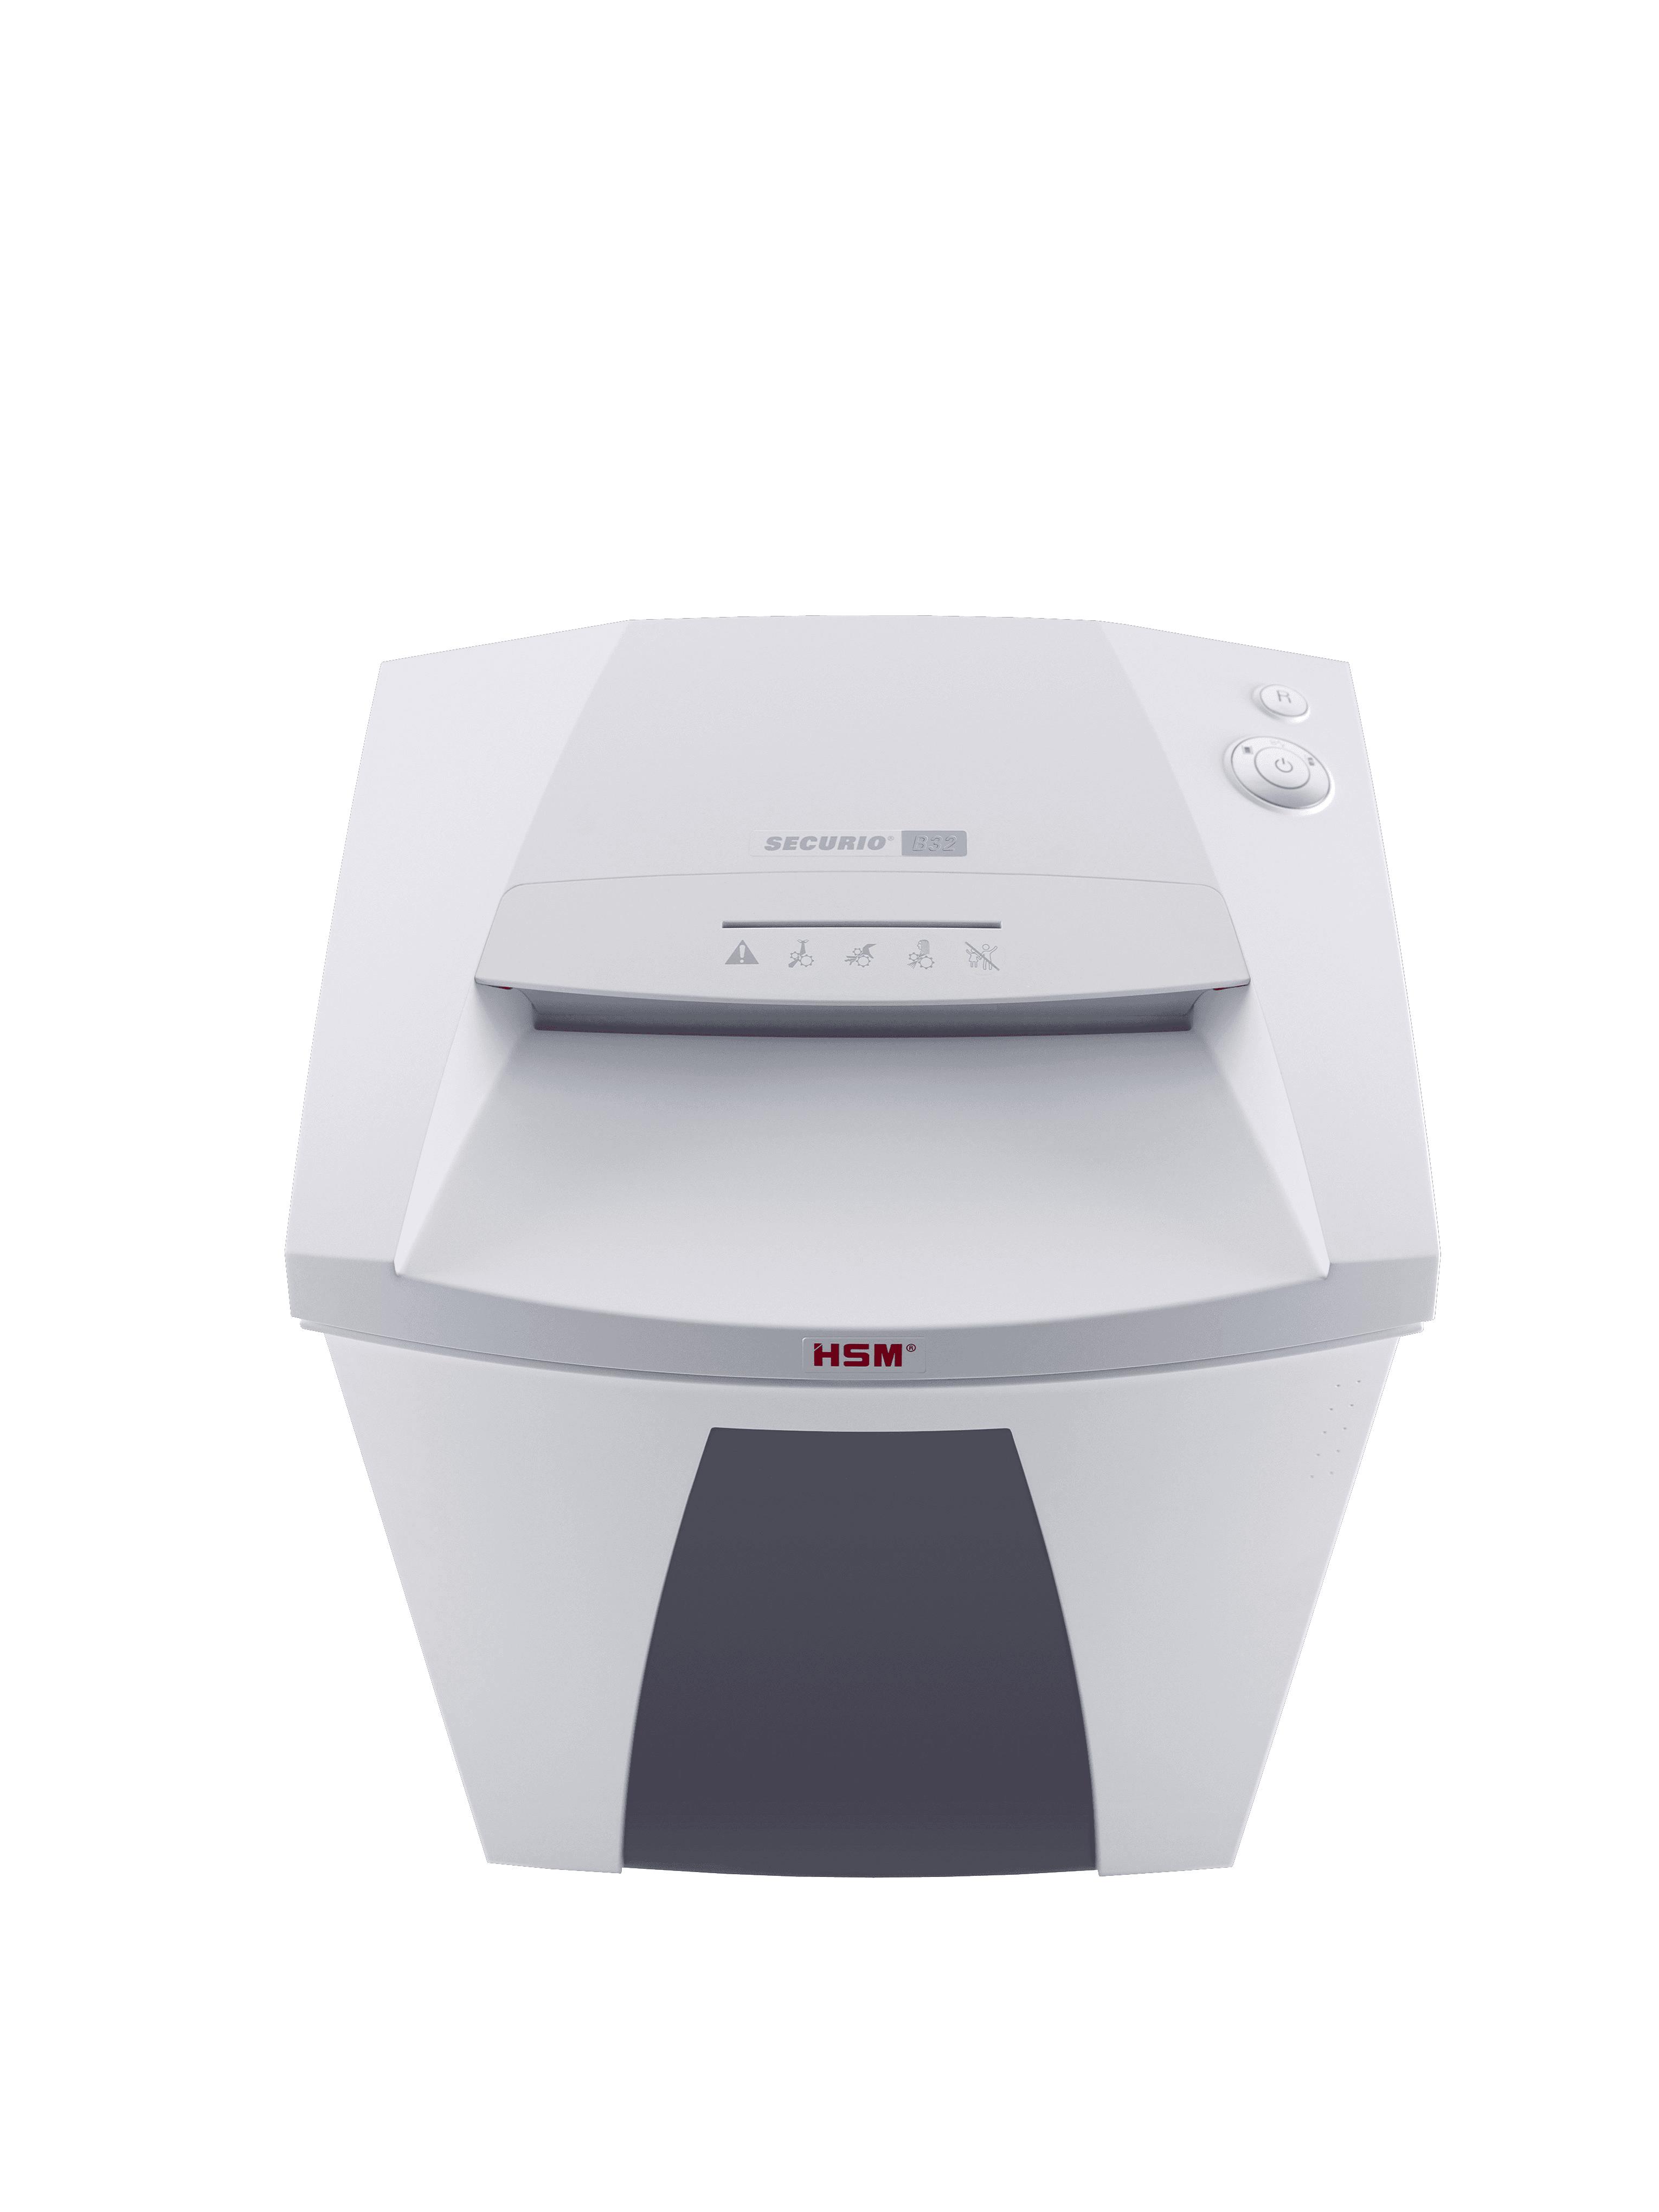 HSM-SECURIO-B32-CD-D1-PNG